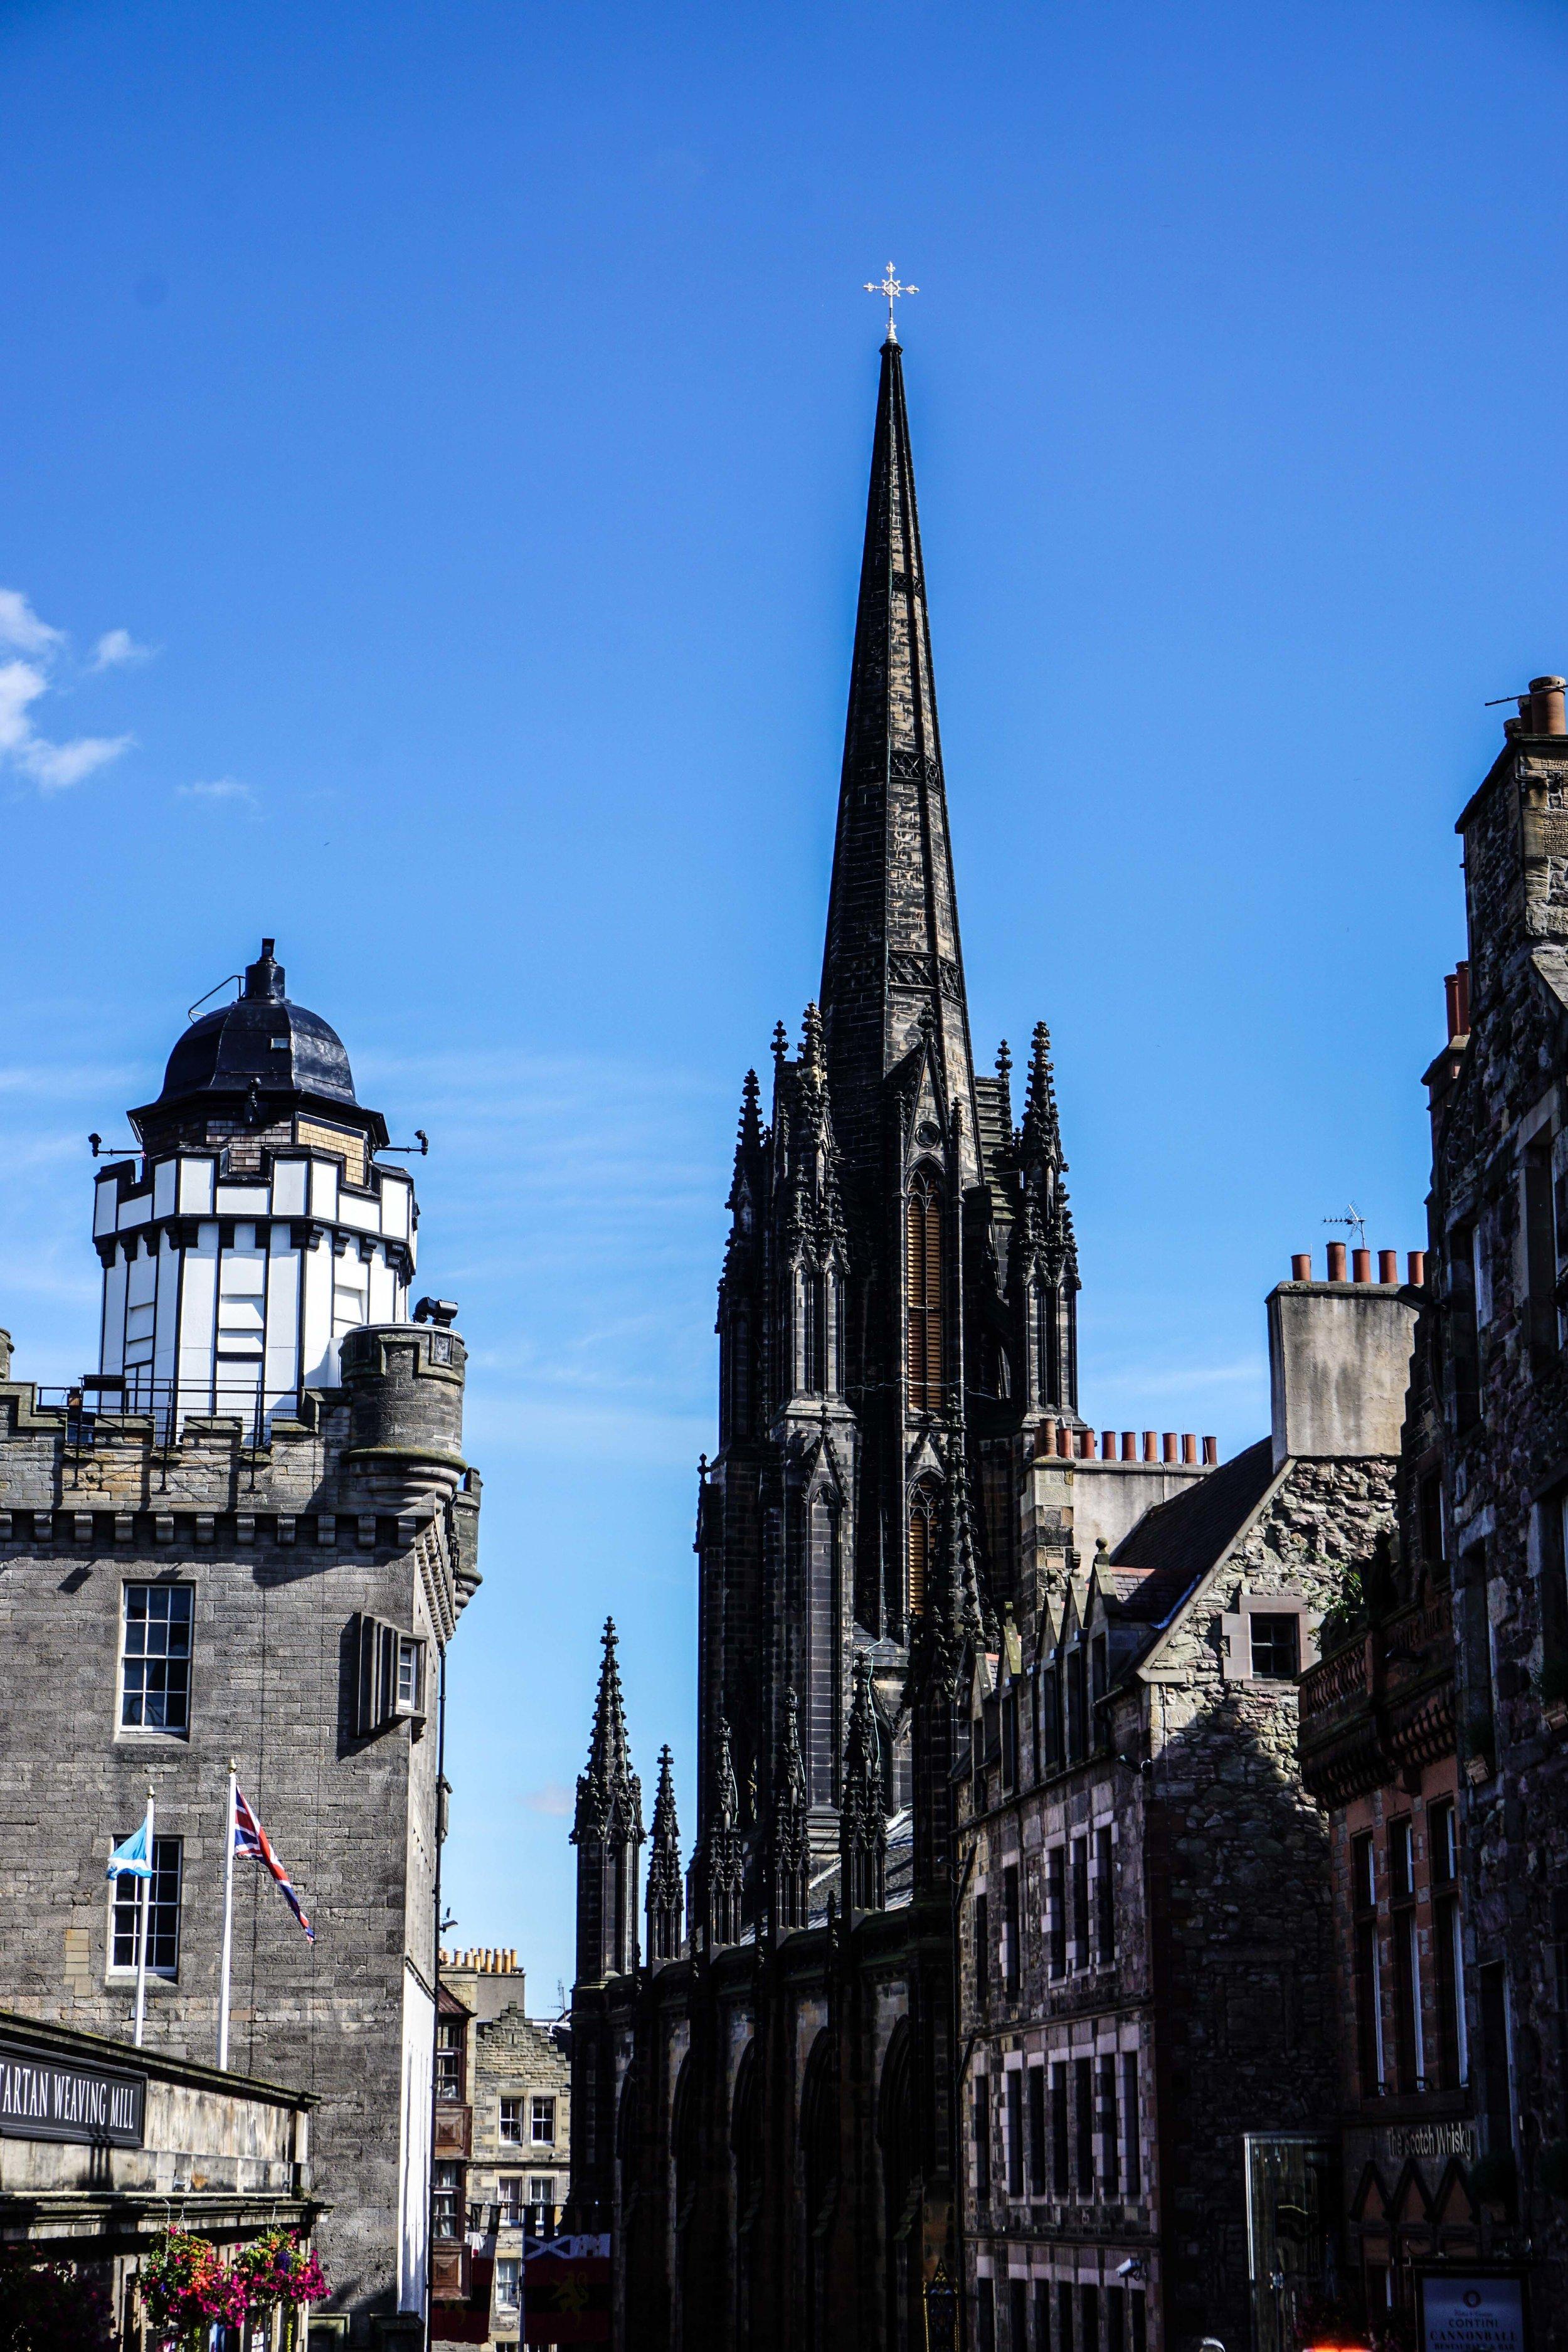 Scotland-Edit-01901.jpg